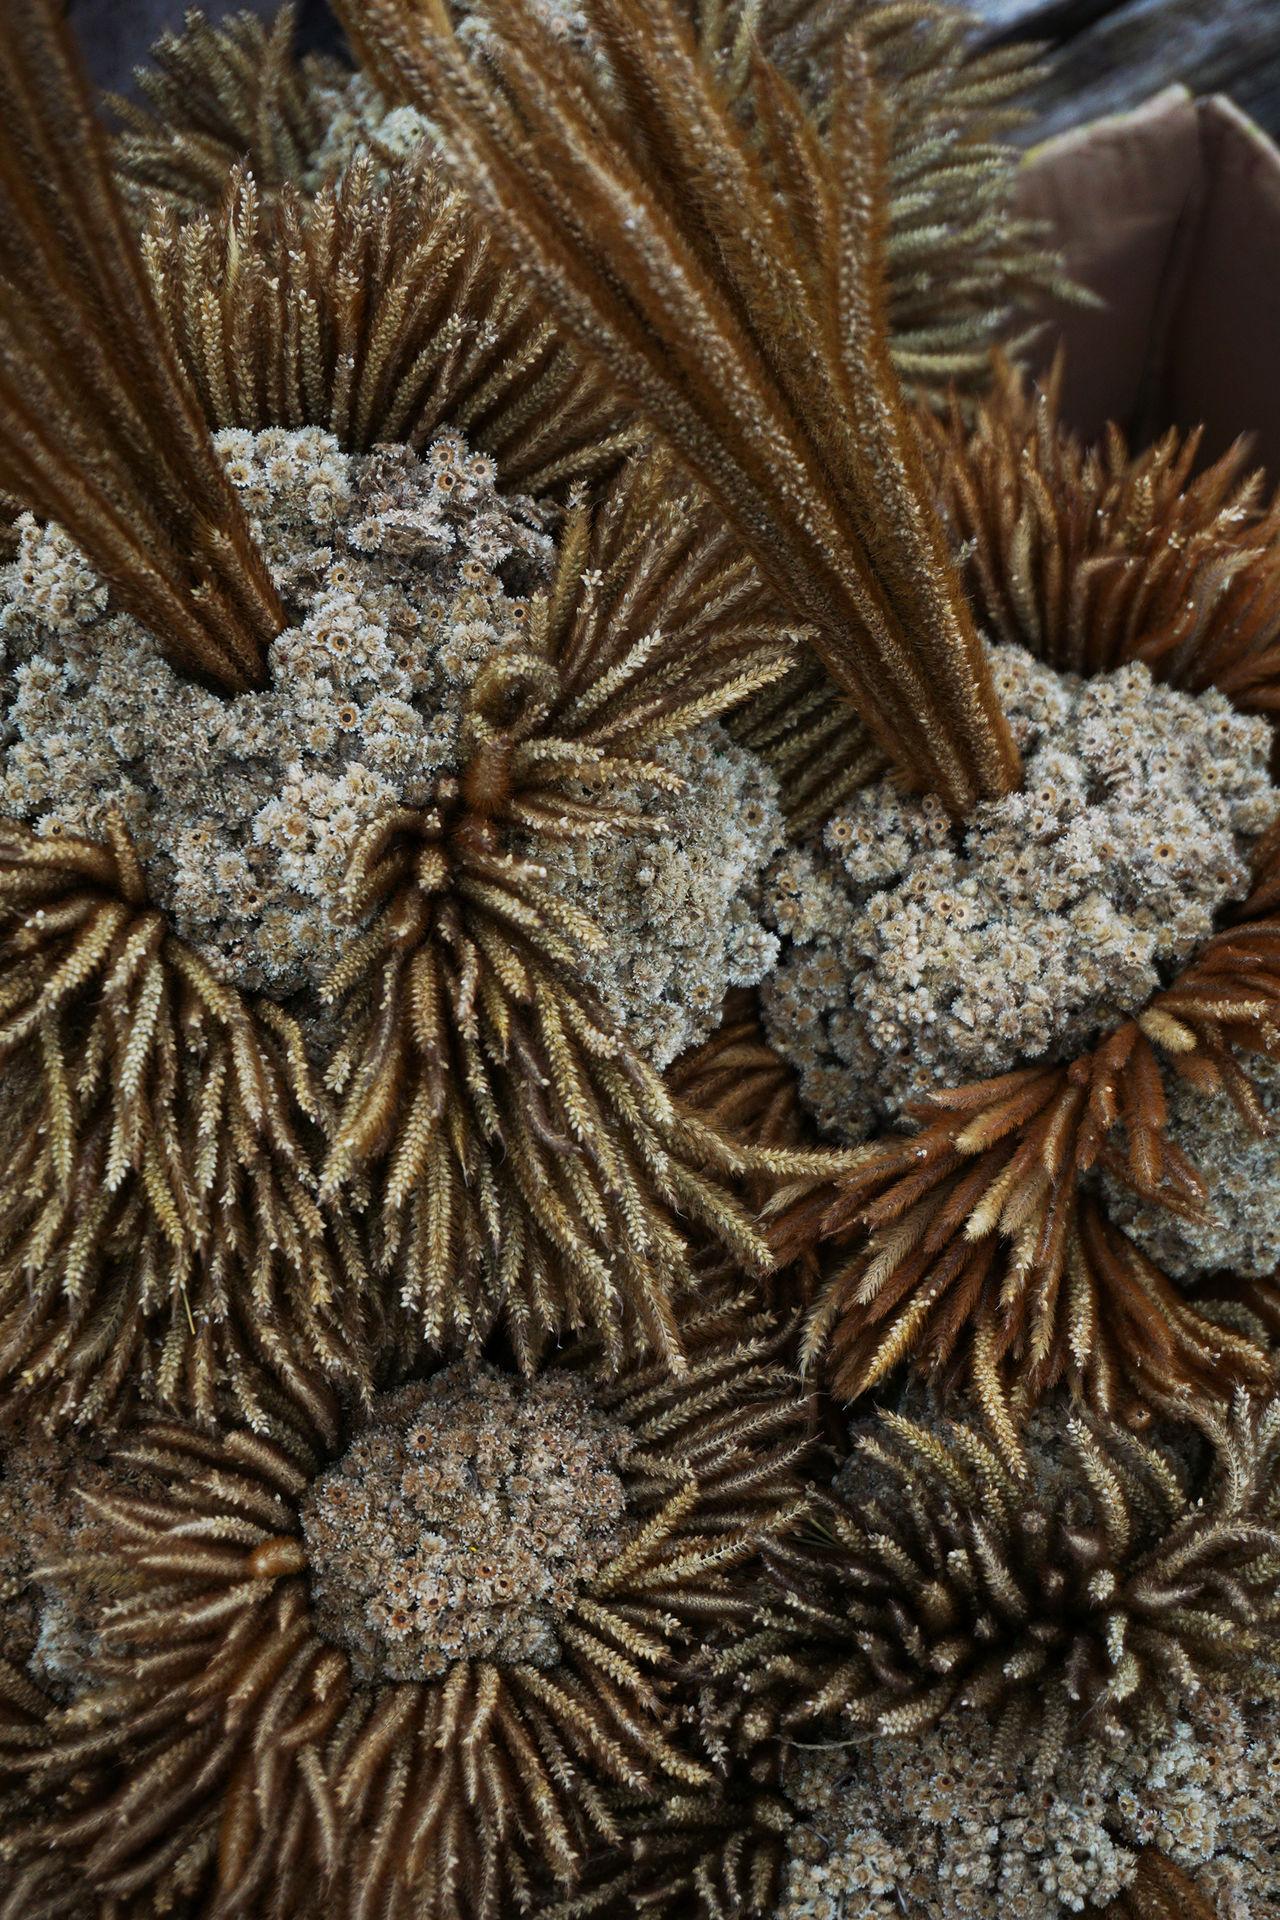 Eternal Flowers at Merapi Jogjakarta #beautiful #bouquet #brown #decoration #driedflowers #Edelweiss Flower #eternal Flower #eternity #forest #holiday #isolated #Jogjakarta #merapi #Mountain #Nature  #scent #travel @white EyeEm Selects EyeEmNewHere